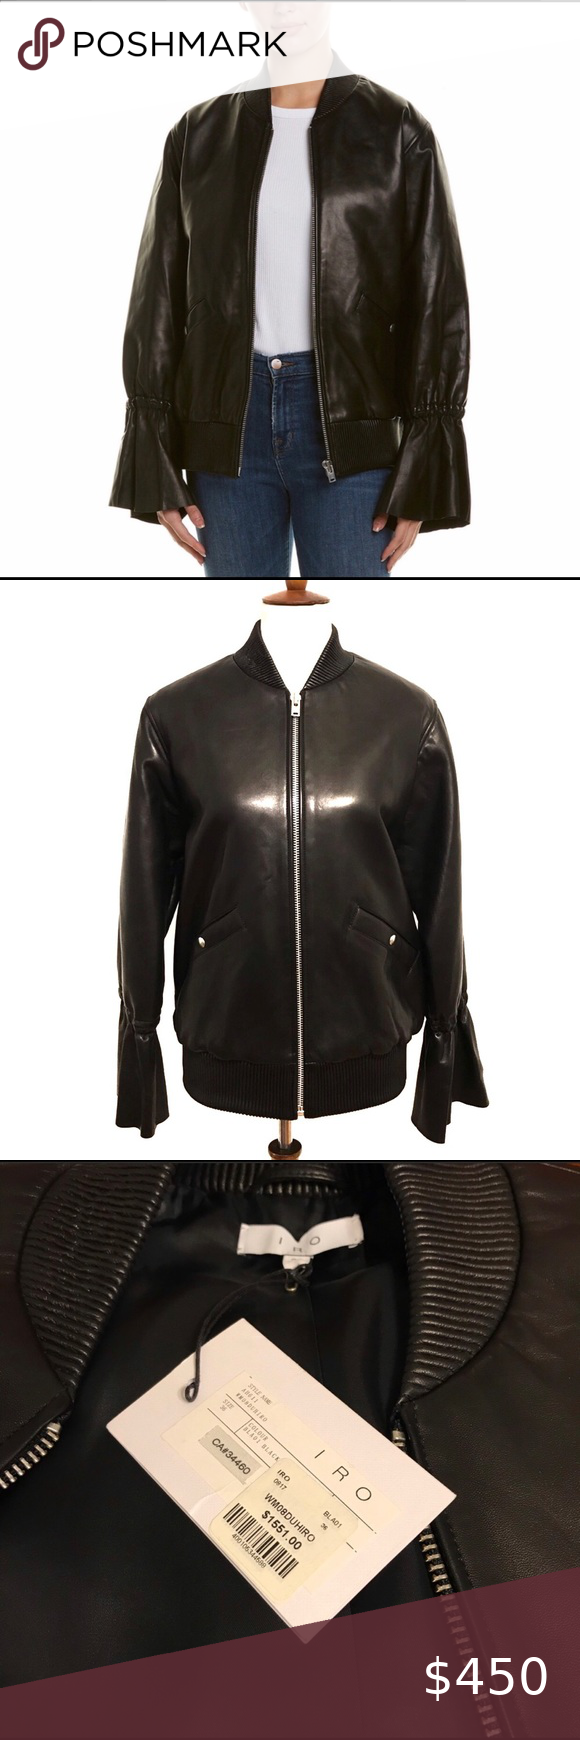 Nwt Iro Black Leather Bell Sleeve Moto Jac Nwt Iro Black 100 Lamb Leather Bomber Jacket Feature Leather Peplum Tops Iro Leather Jacket Leather Bomber Jacket [ 1740 x 580 Pixel ]